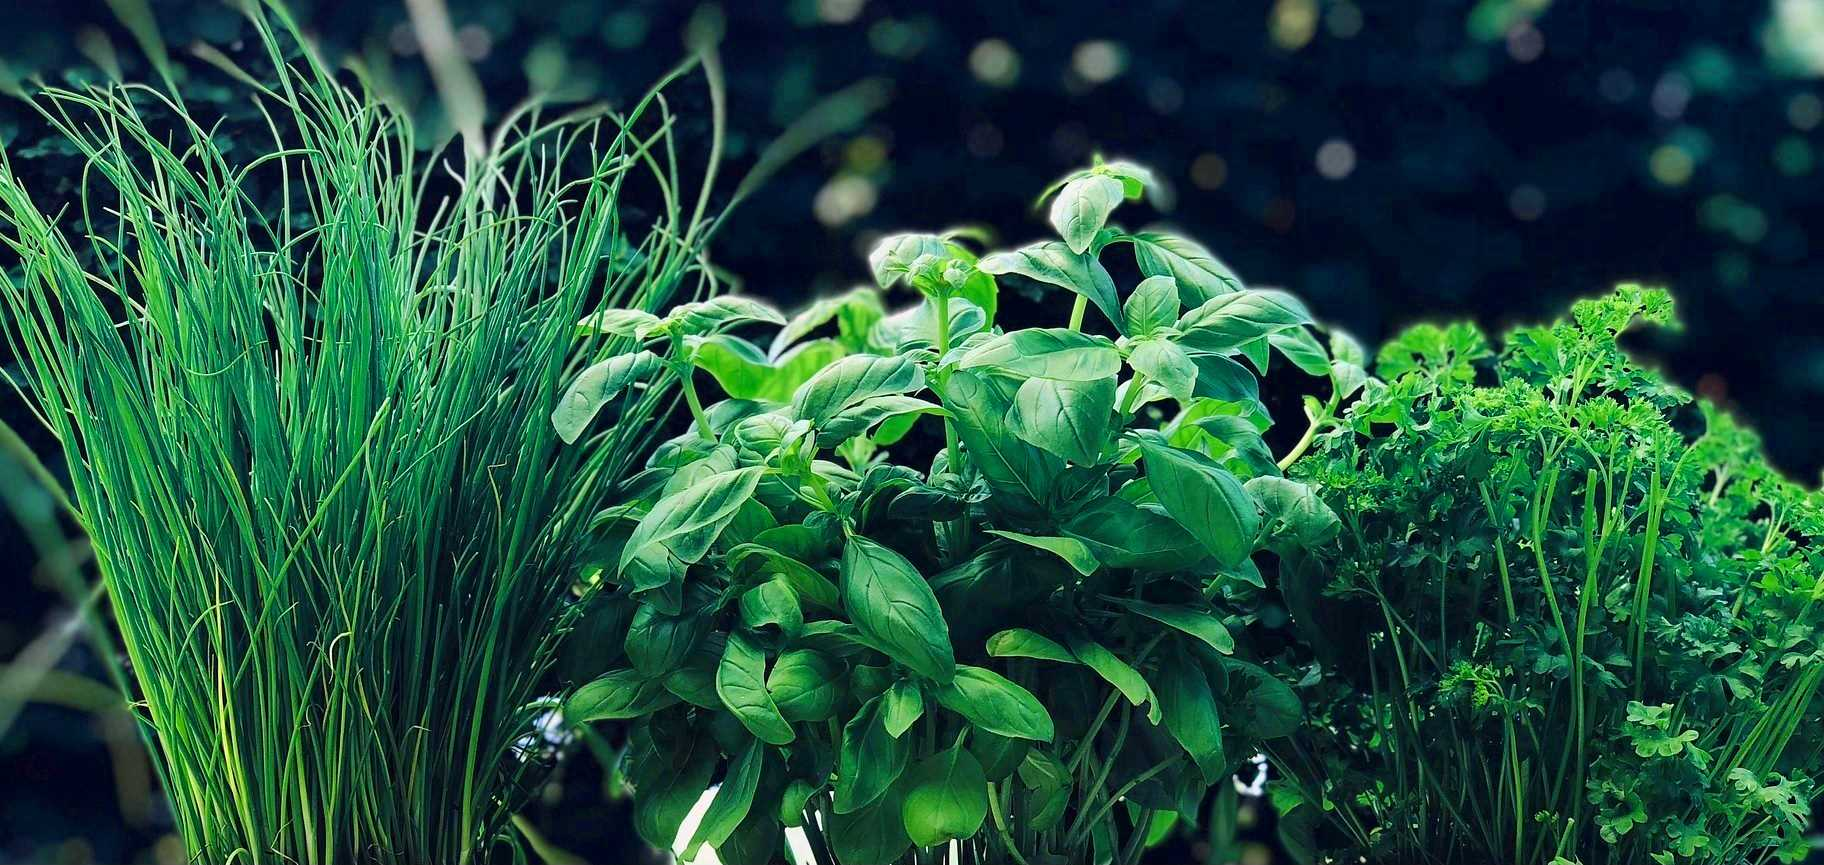 Aromatiques Geny Cernay